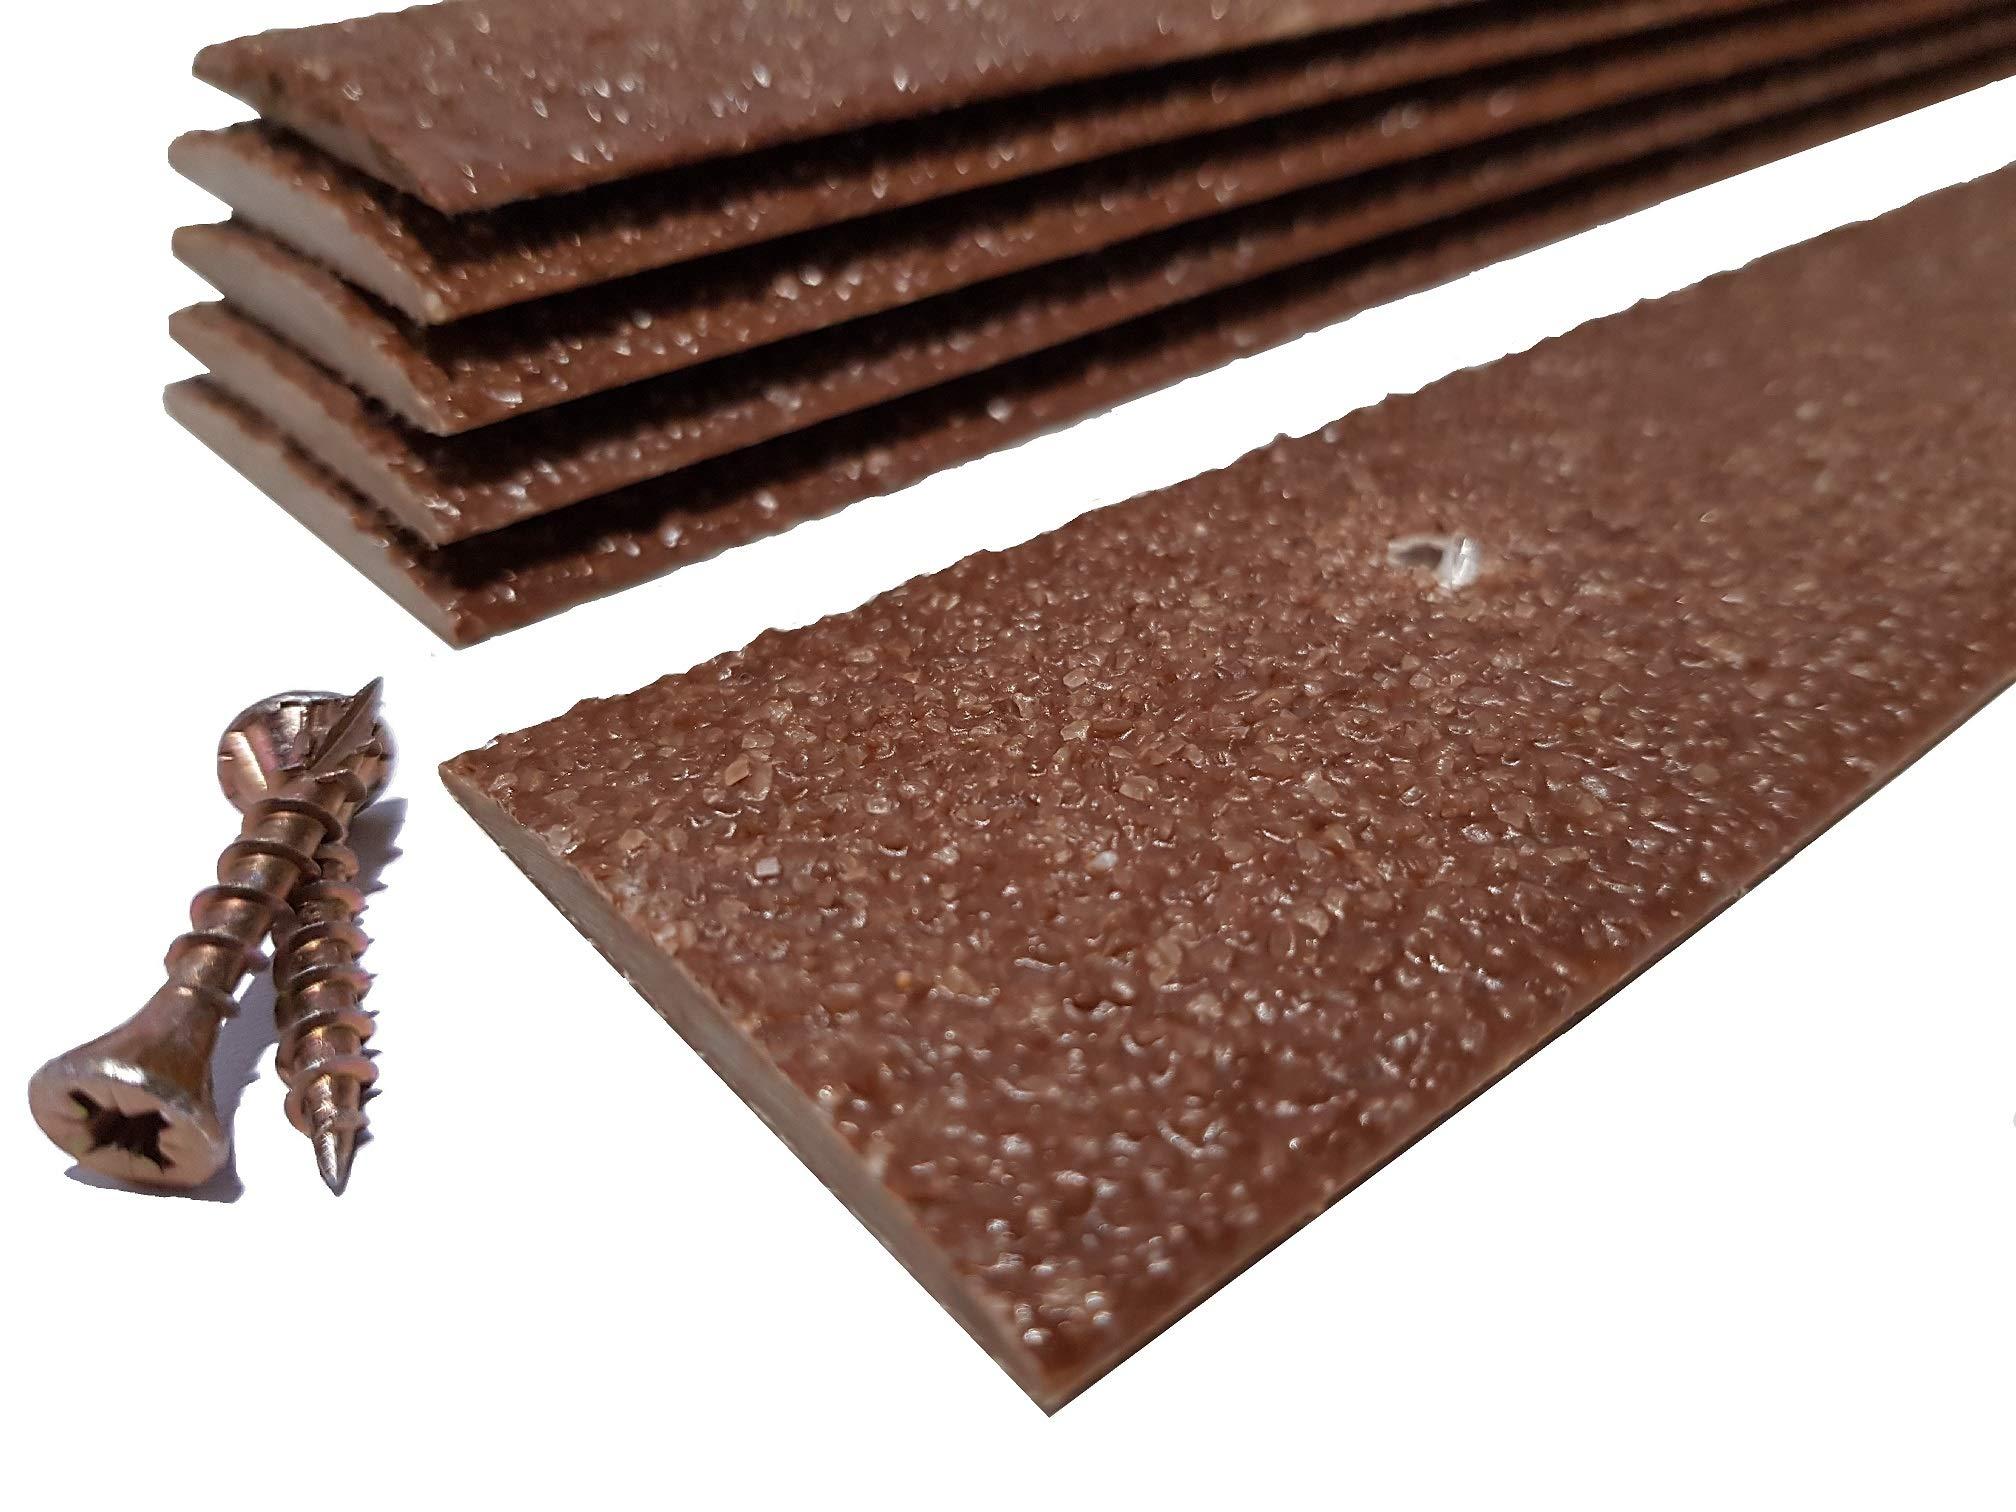 600mm long 30 Convex Anti Slip Deck Strips Non Slip Grip for Steps /& Decking